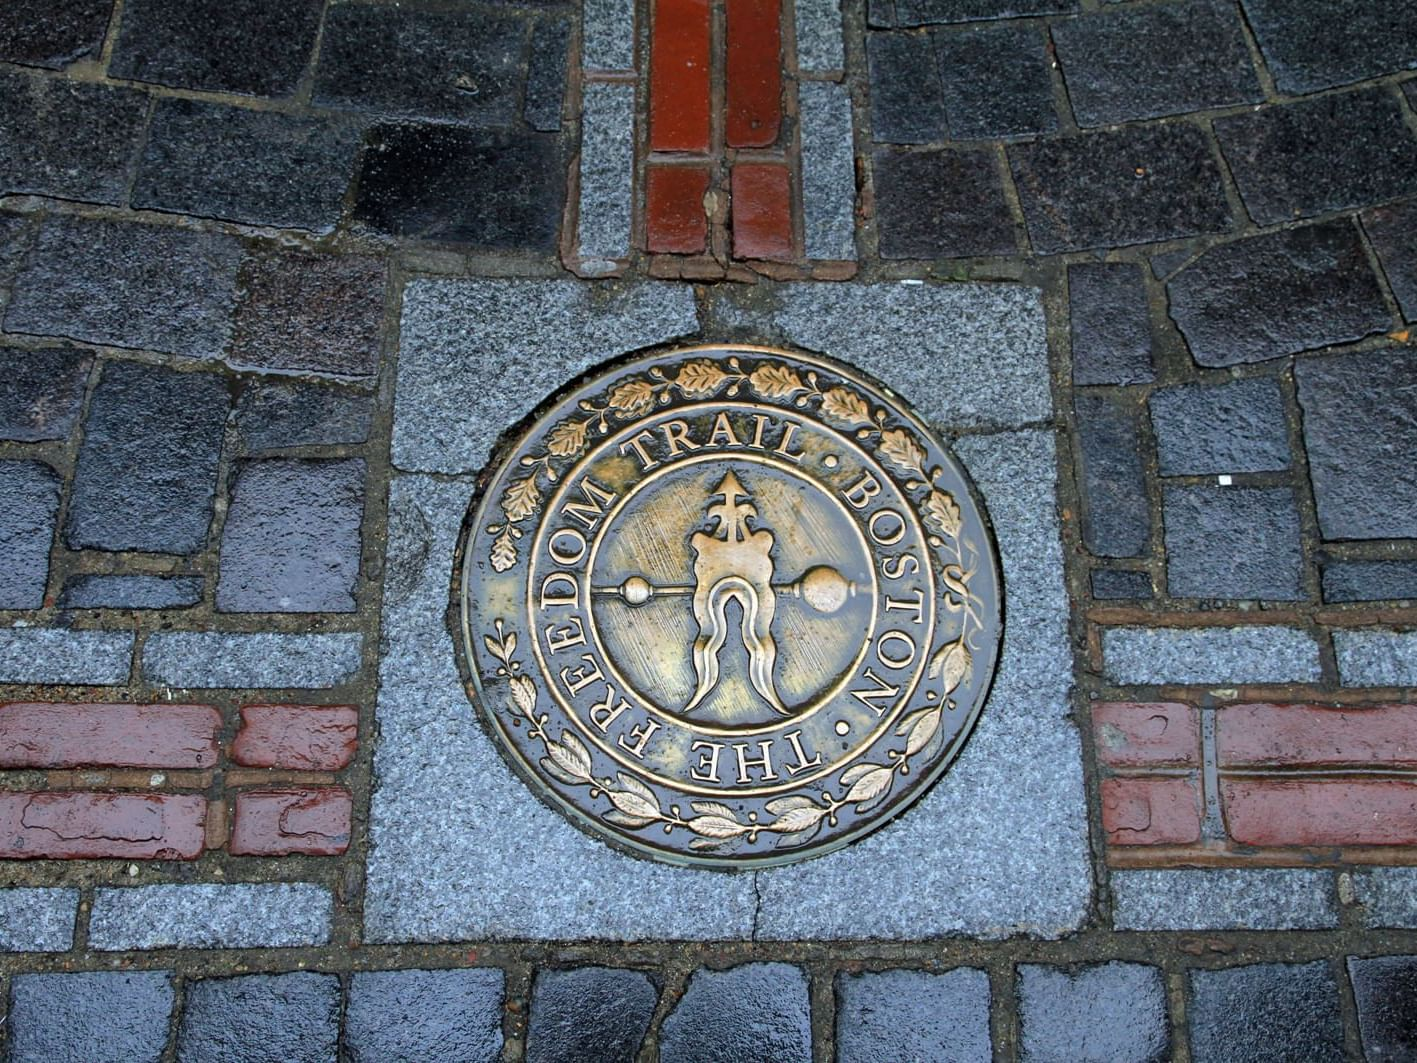 The Freedom Trial logo